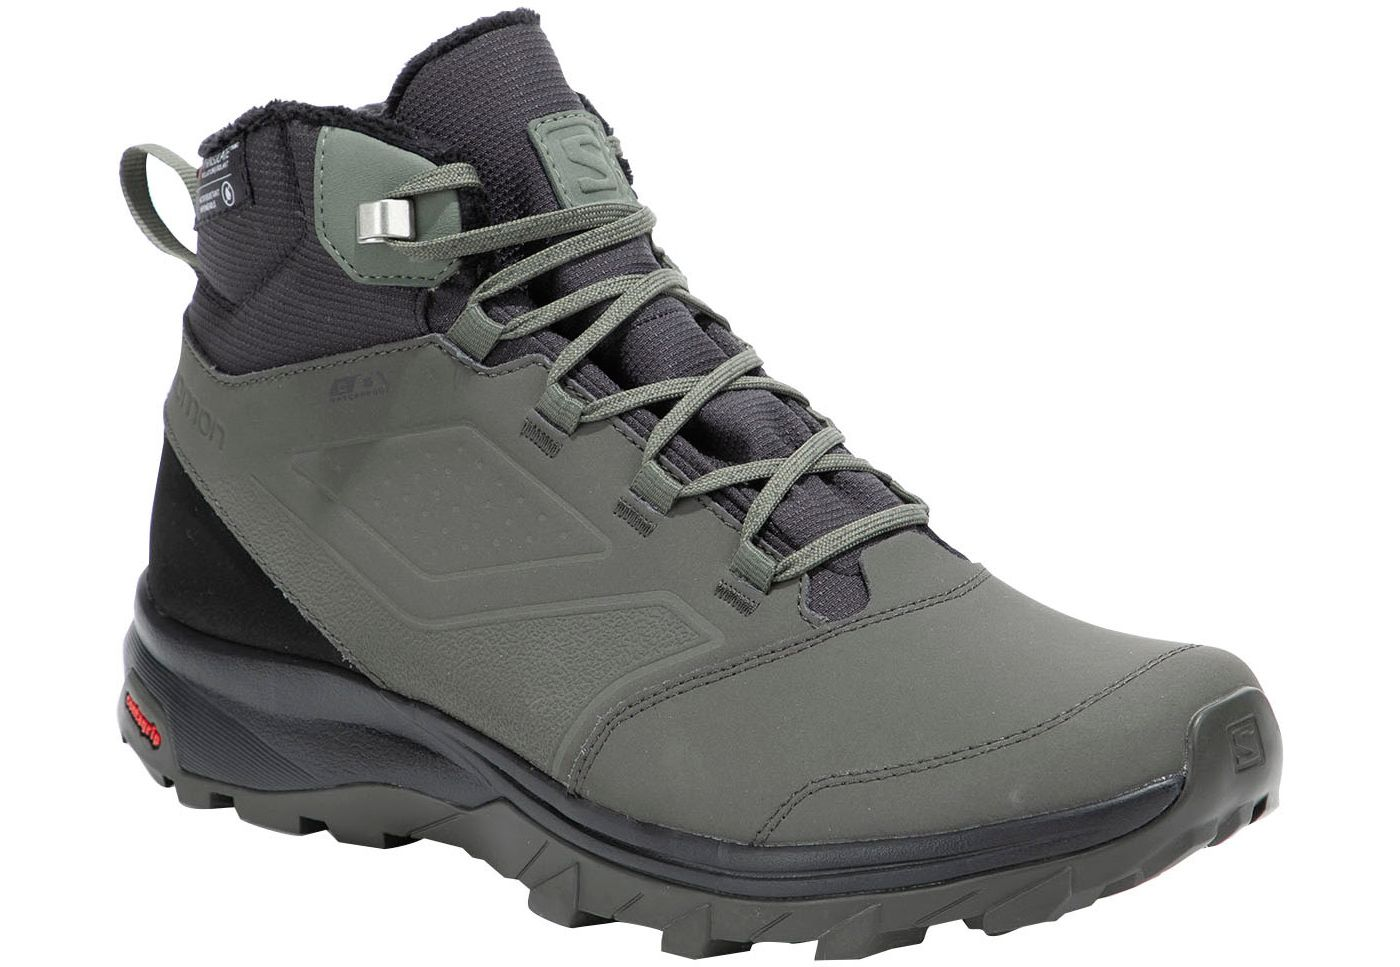 Salomon Men's Yalta 200g Waterproof Winter Boots